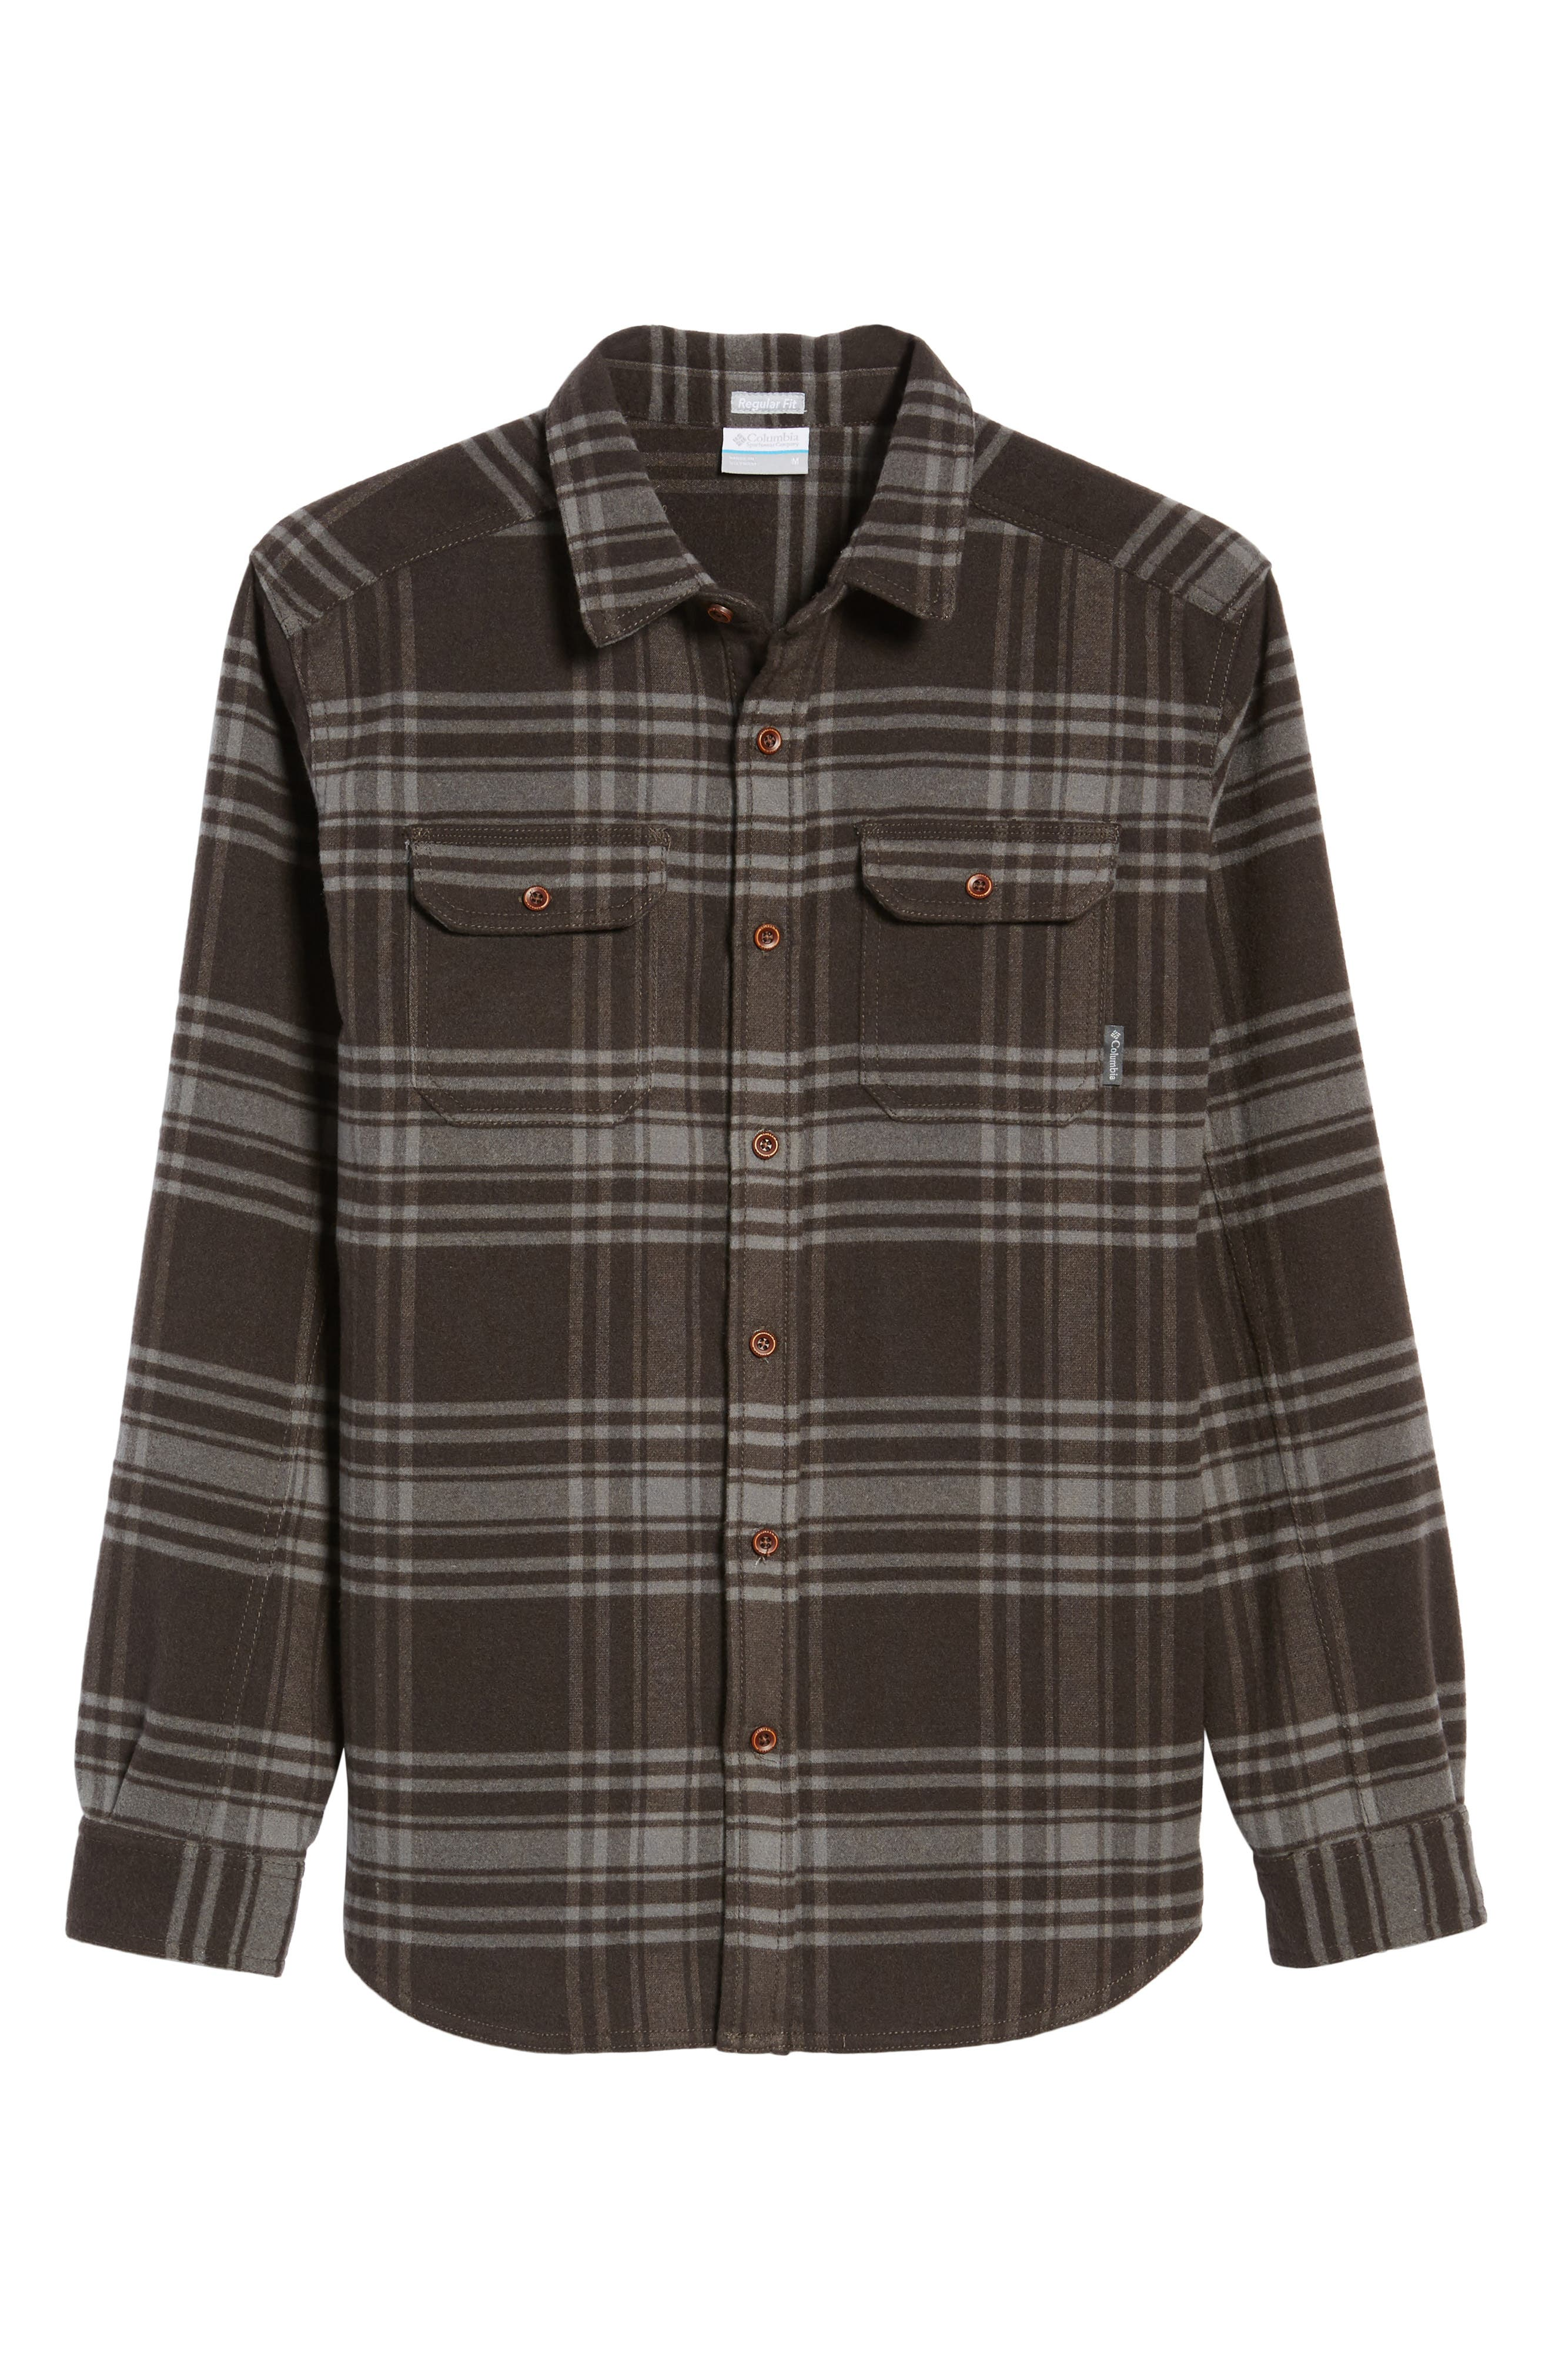 Deschutes River<sup>™</sup> Heavyweight Flannel Shirt Jacket,                             Alternate thumbnail 5, color,                             200